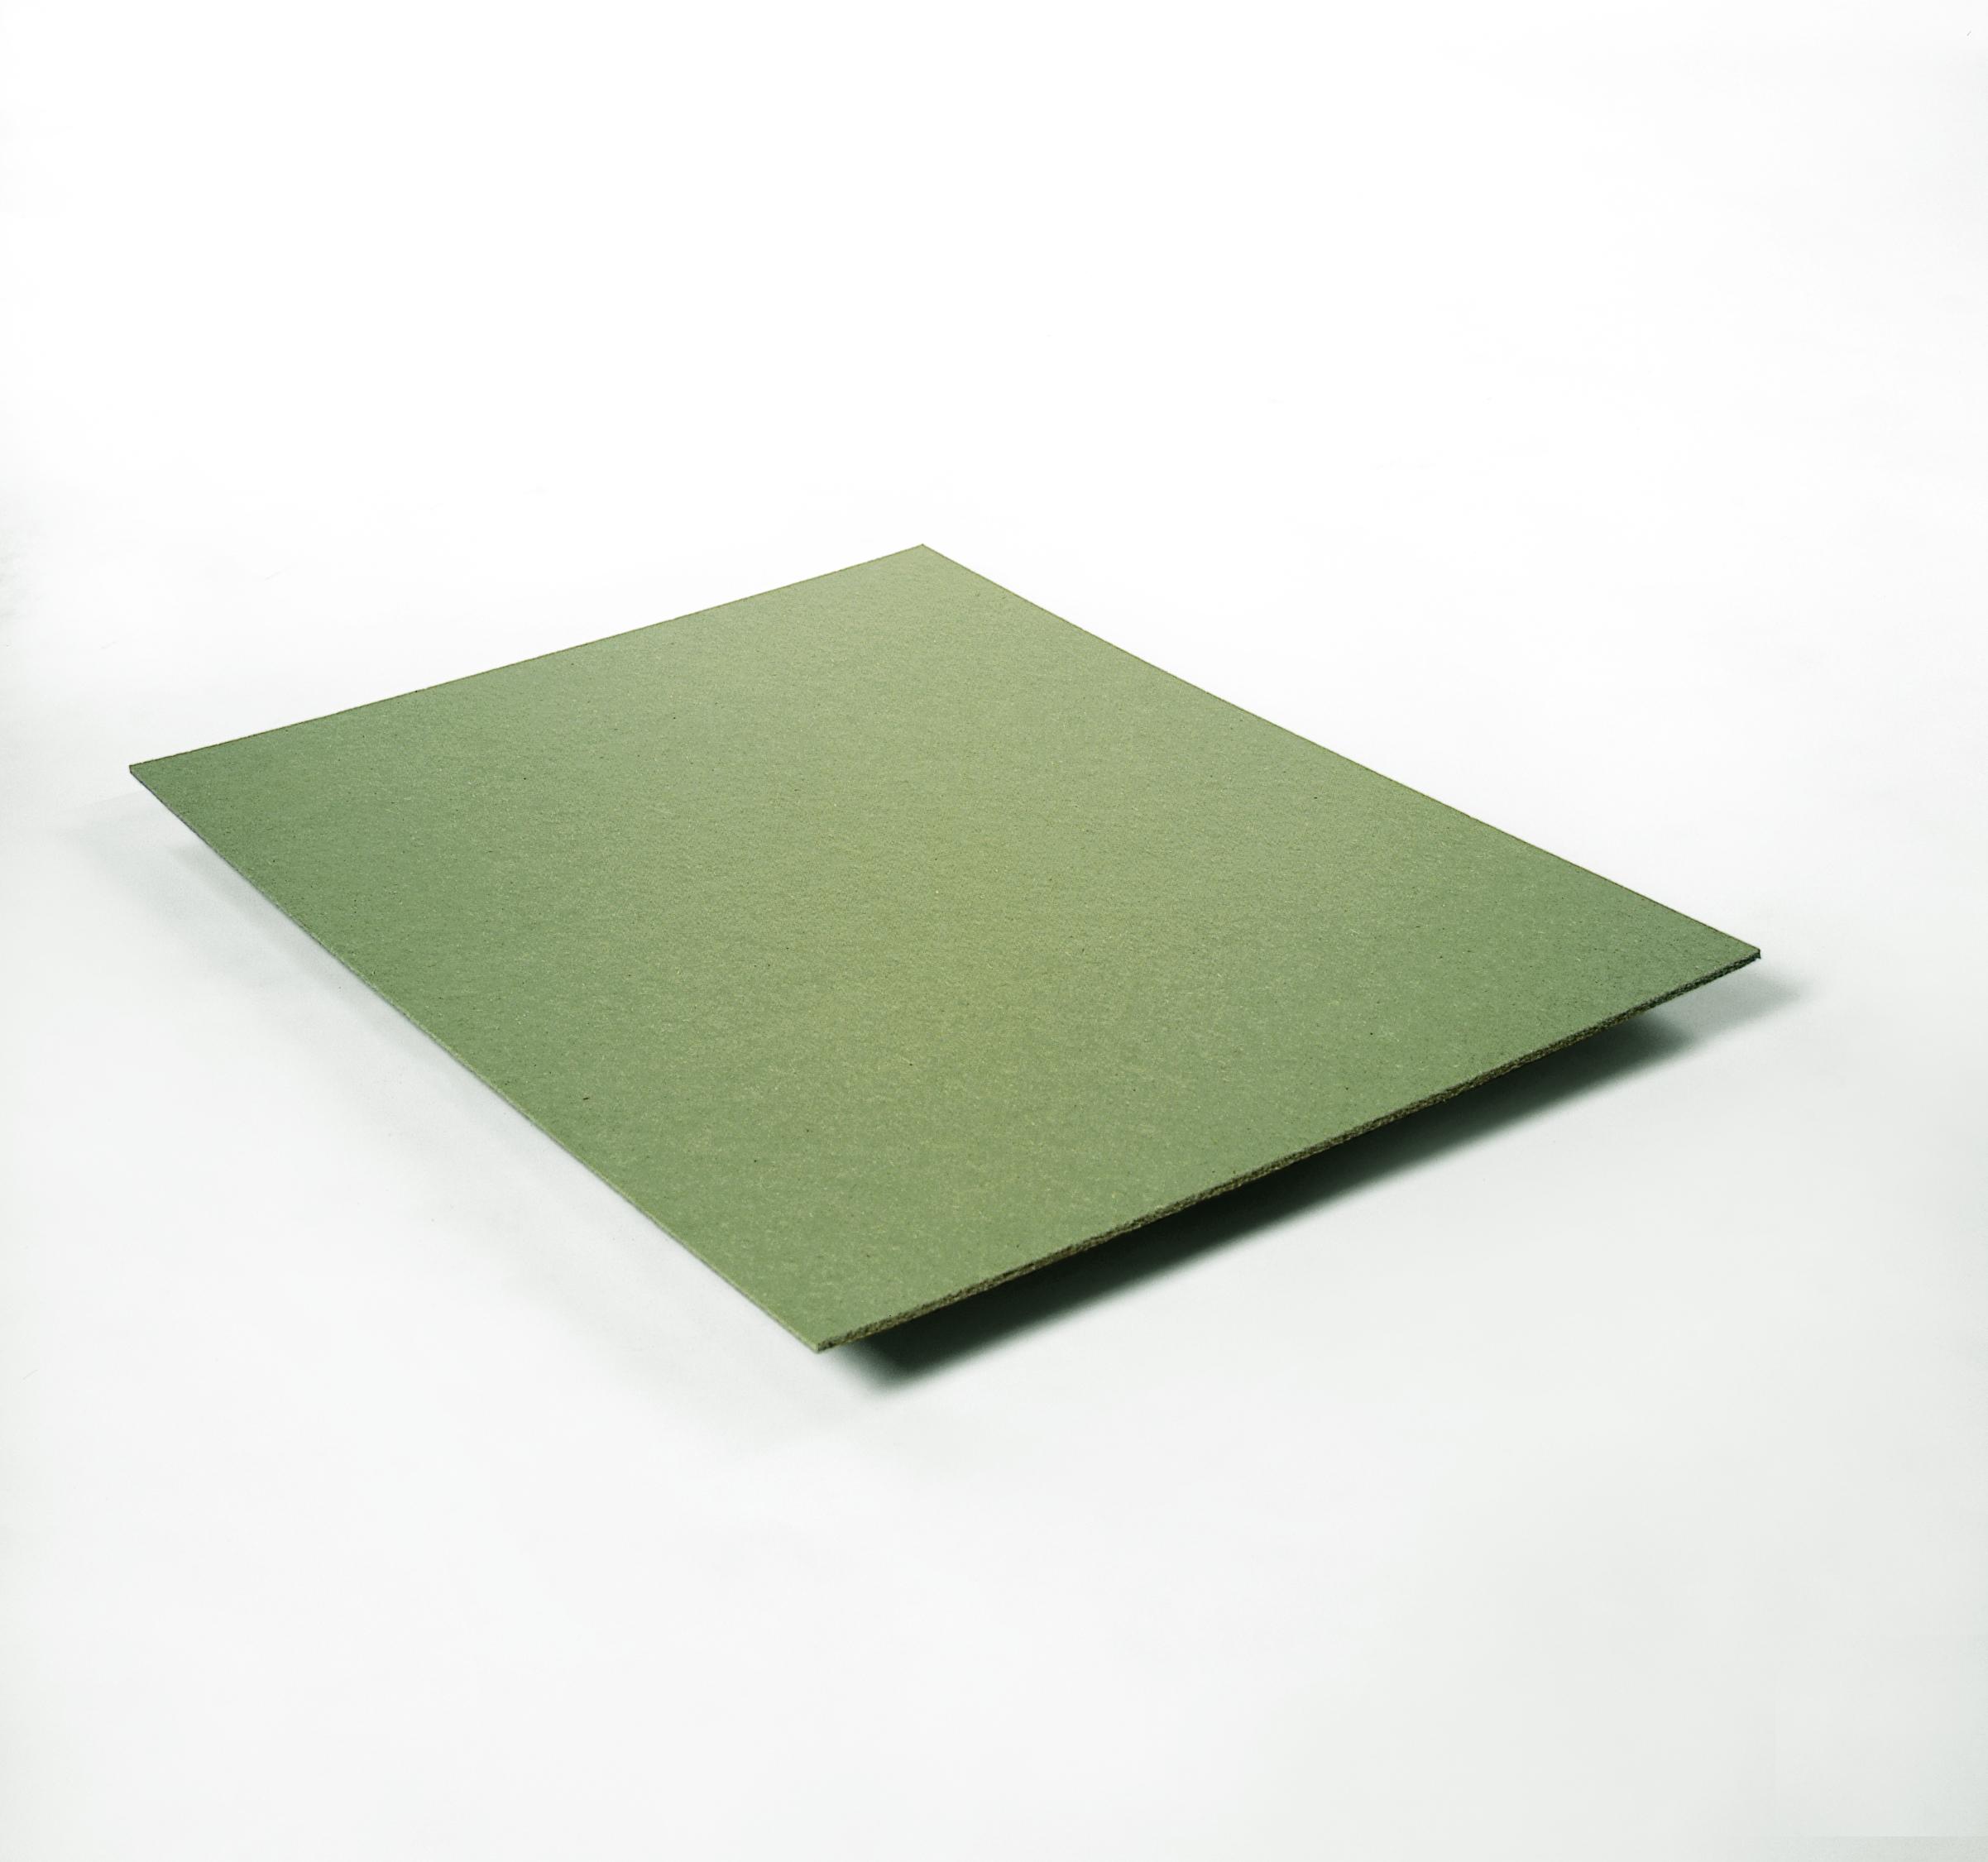 STEICO underfloor · 5 mm